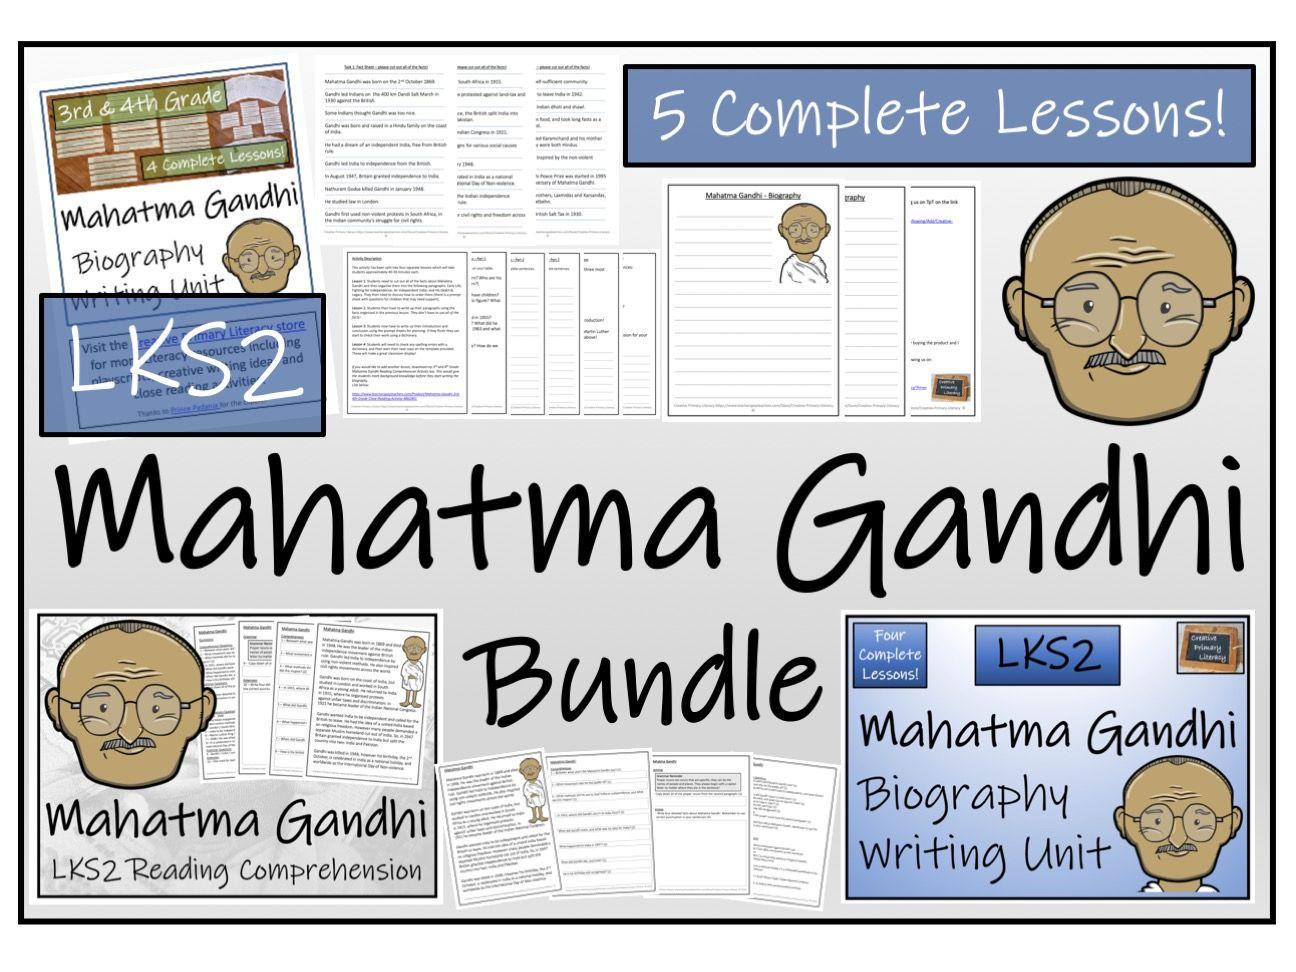 LKS2 History - Mahatma Gandhi Reading Comprehension & Biography Bundle